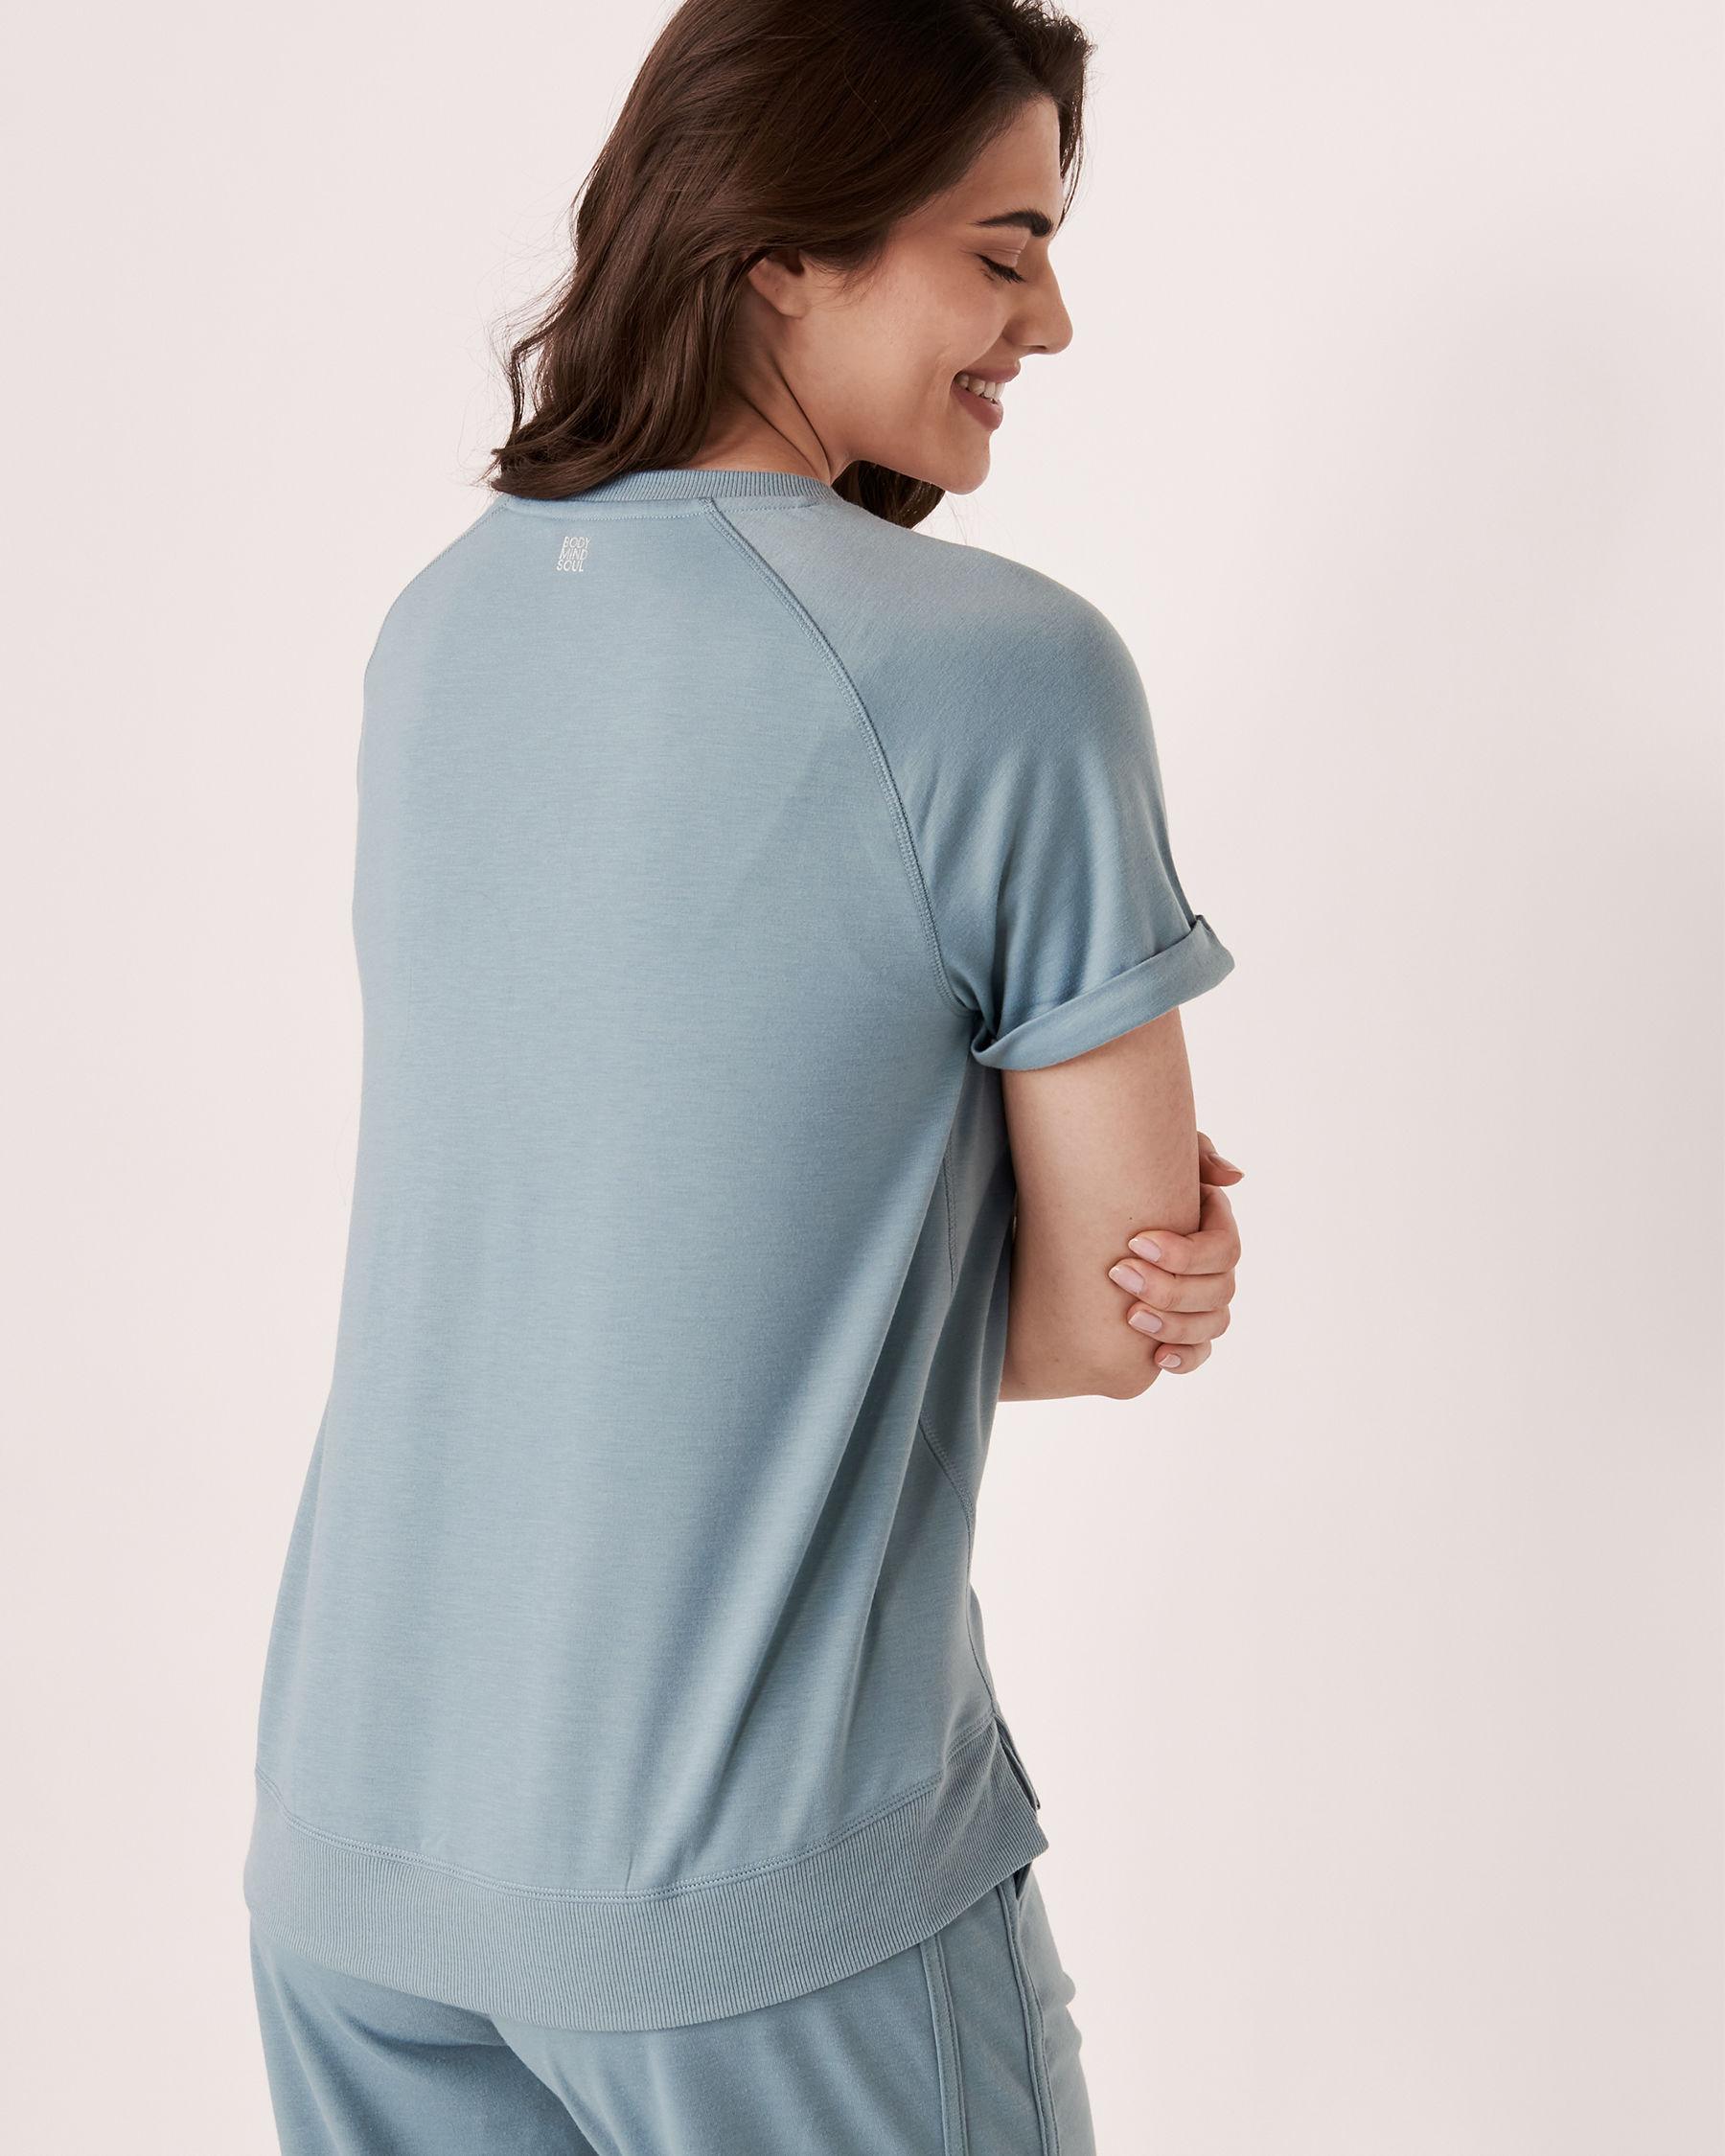 LA VIE EN ROSE Raglan Sleeve Crew Neck T-shirt Blue grey 50100005 - View2